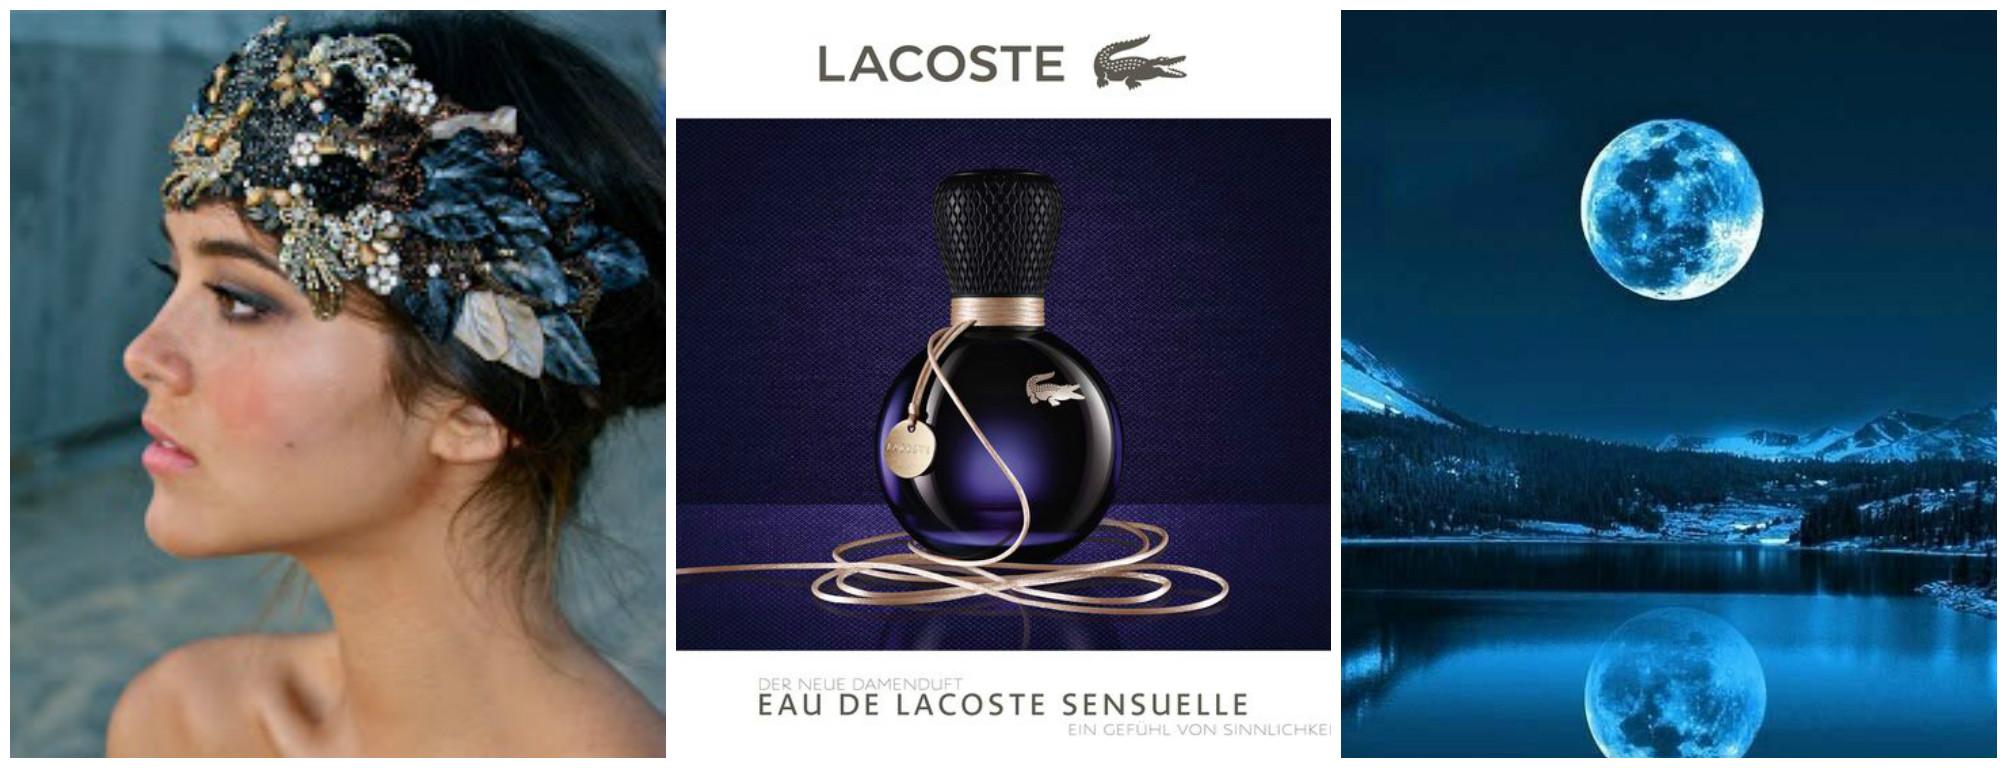 Perfume of the Day: Eau de Lacoste Sensuelle by Lacoste